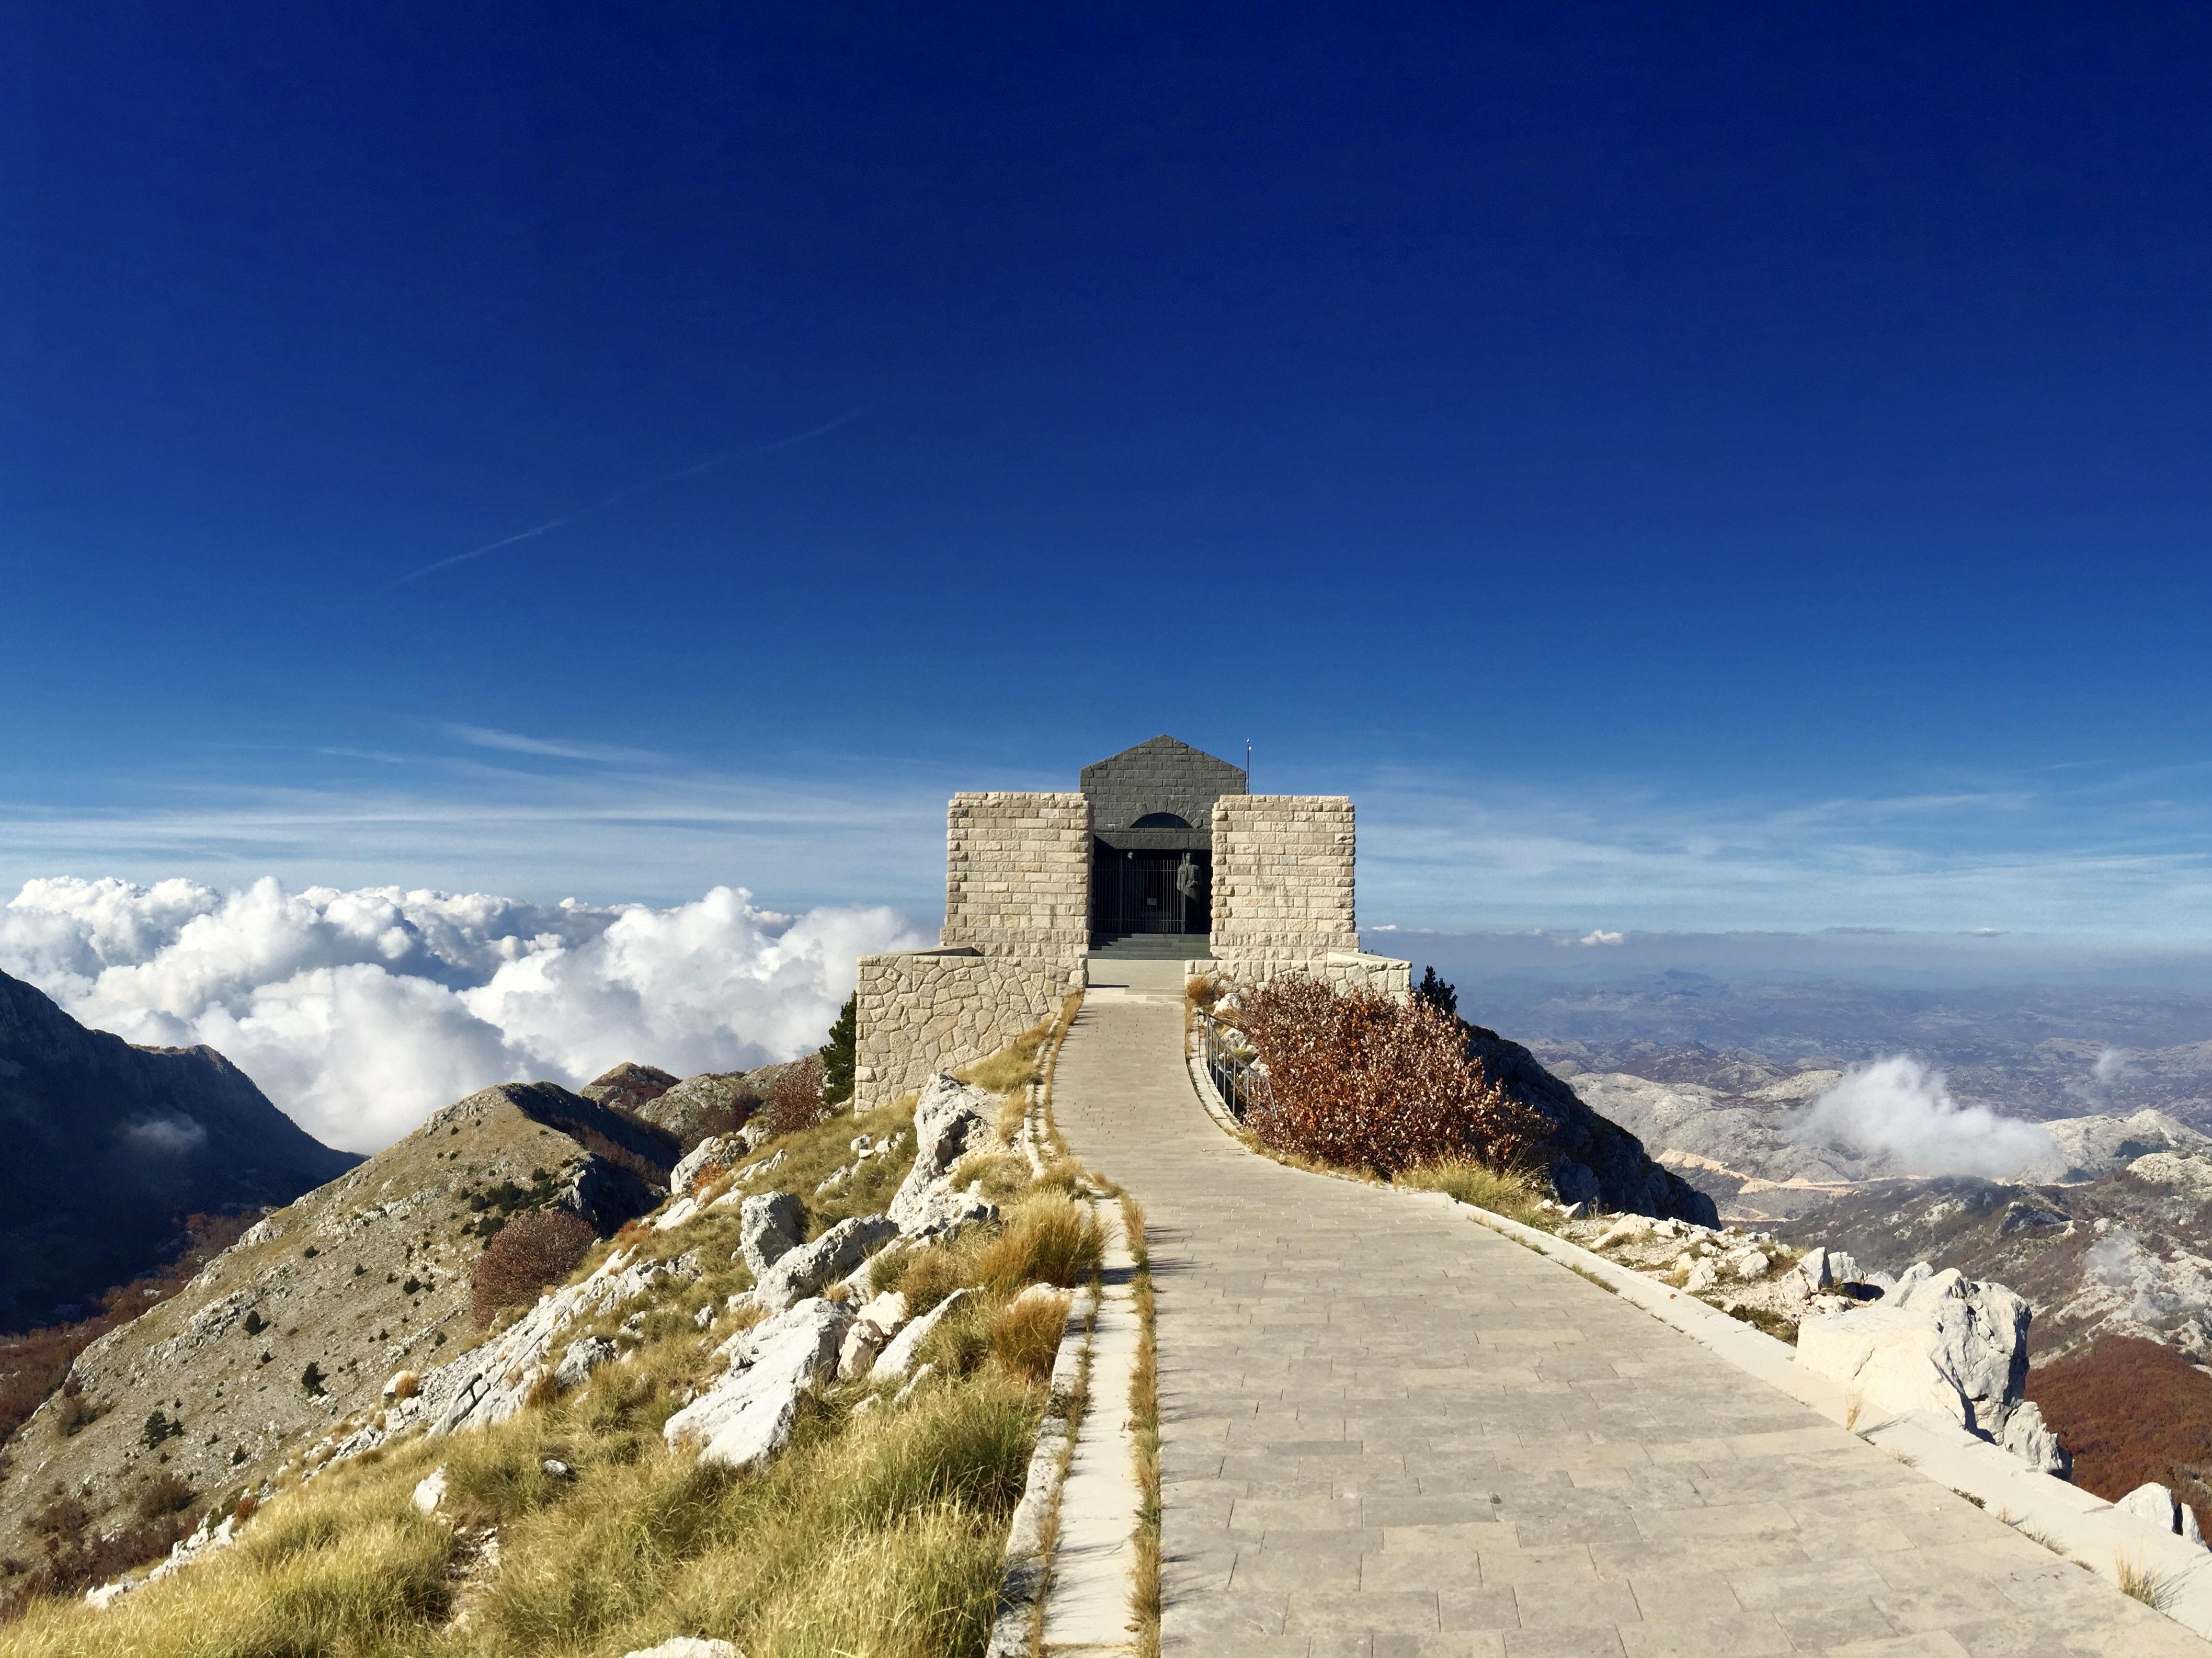 Alltagsträumer - Montenegro - Njegos Mausoleum